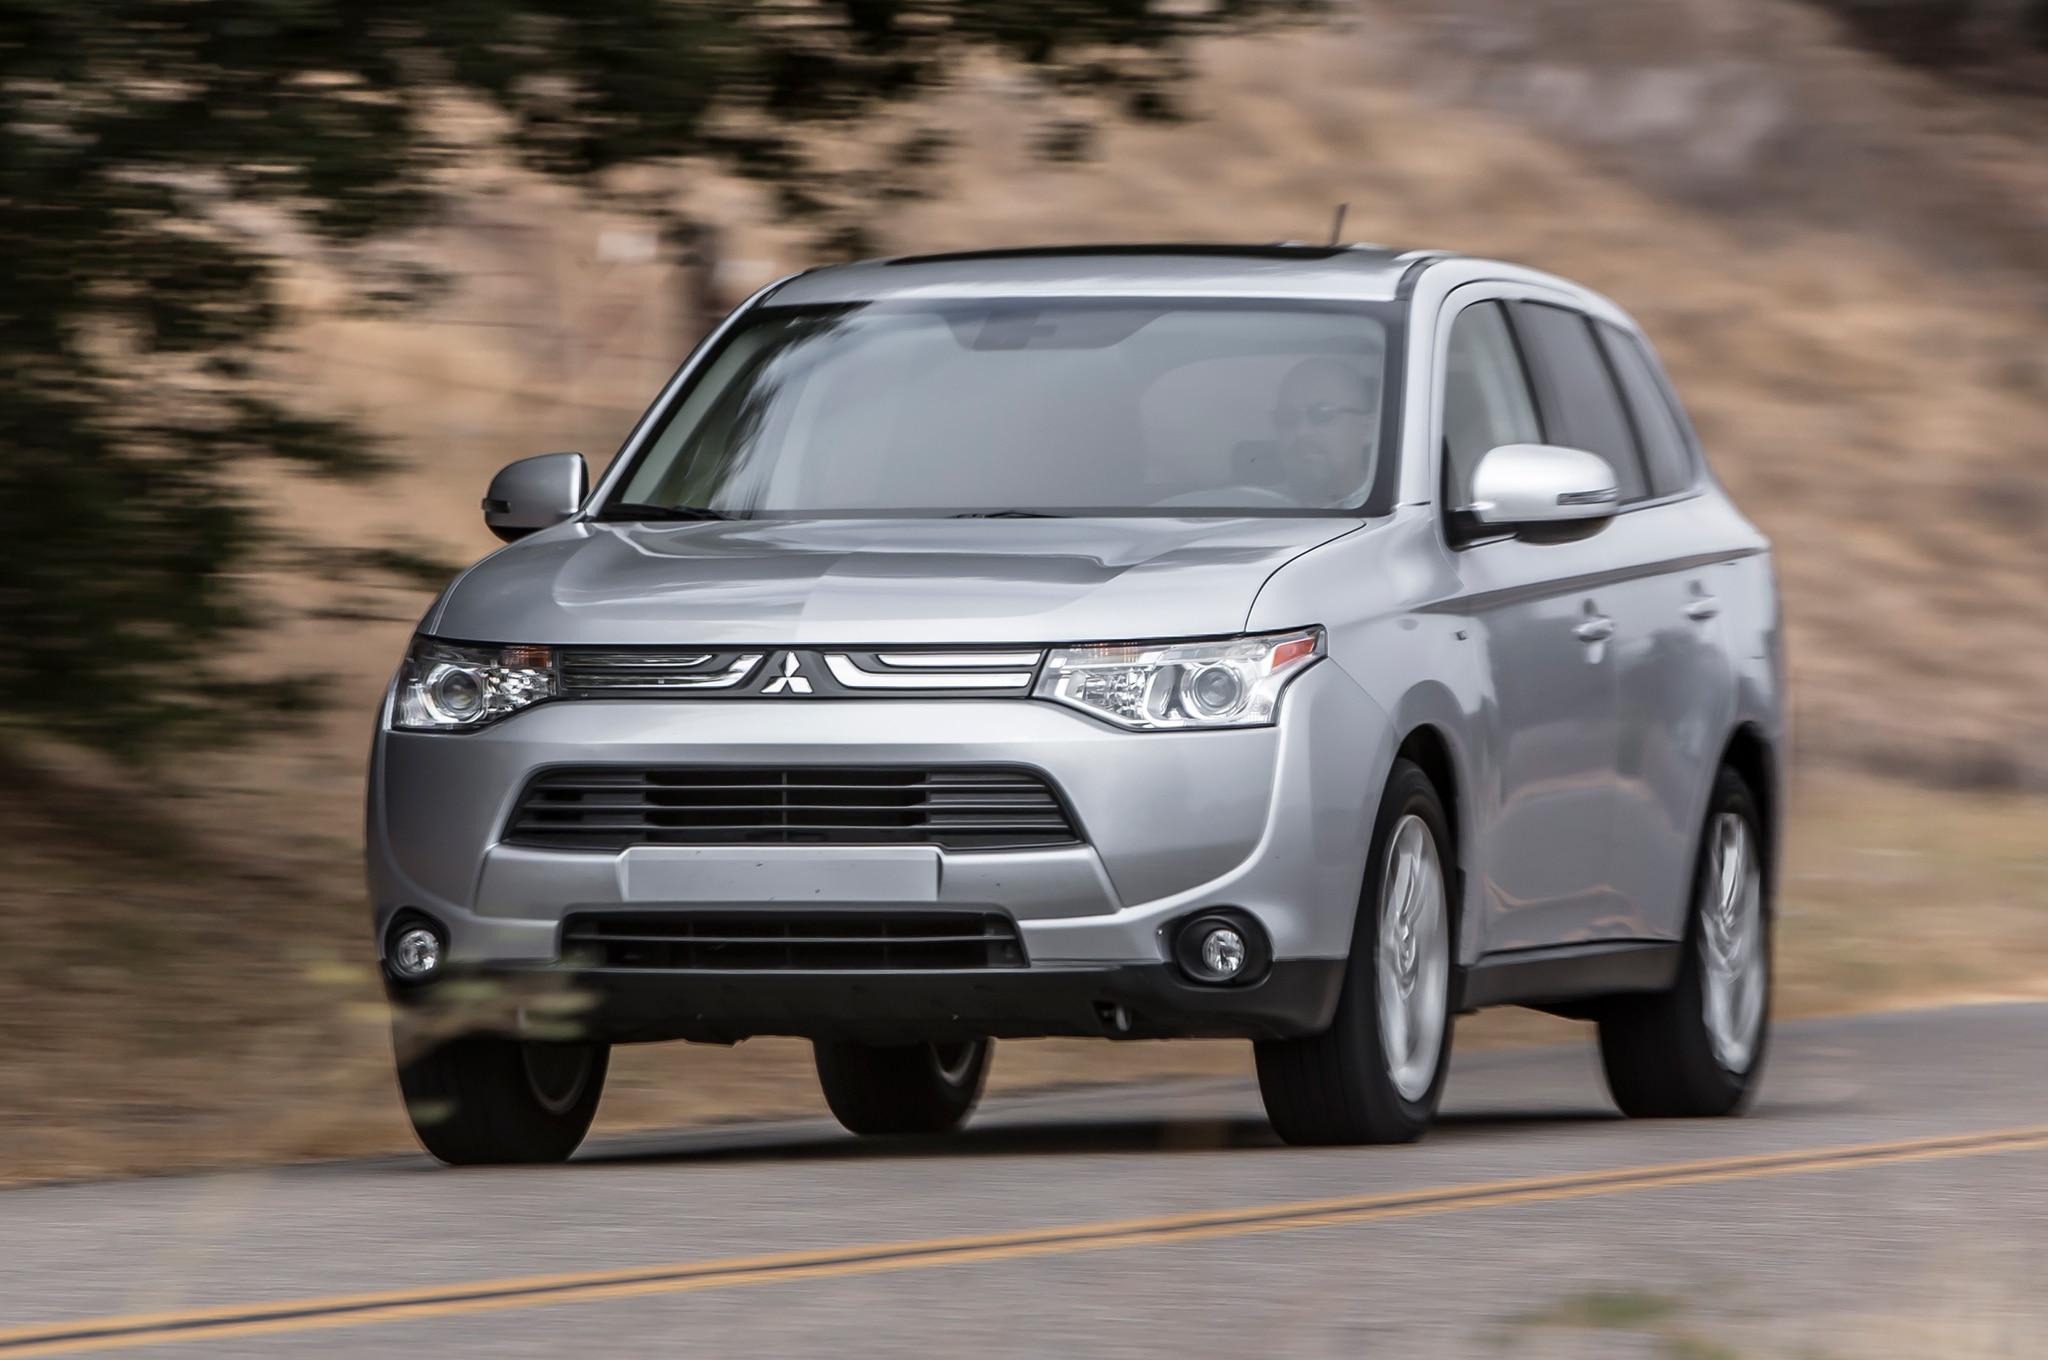 2014 Mitsubishi Outlander Rated Top Safety Pick +